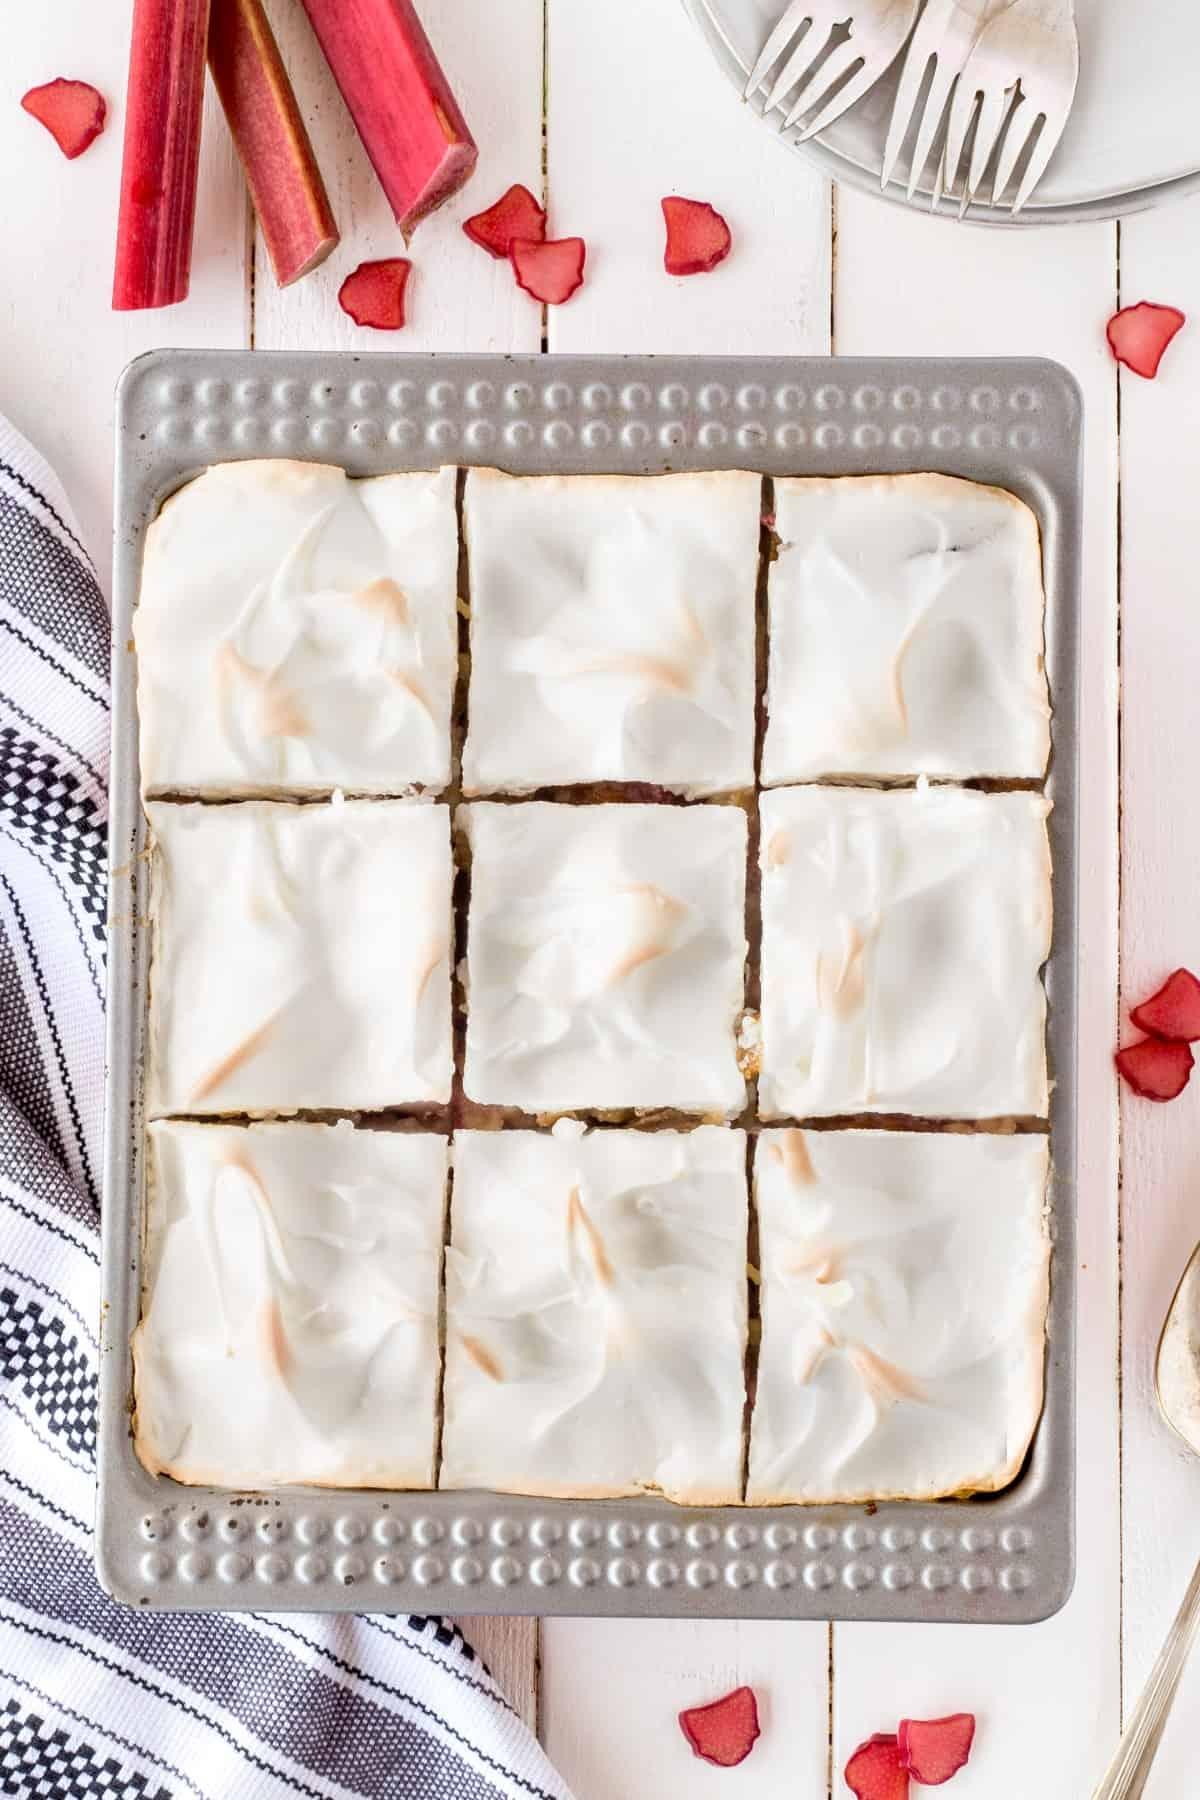 Overhead shot of dessert cut into squares.